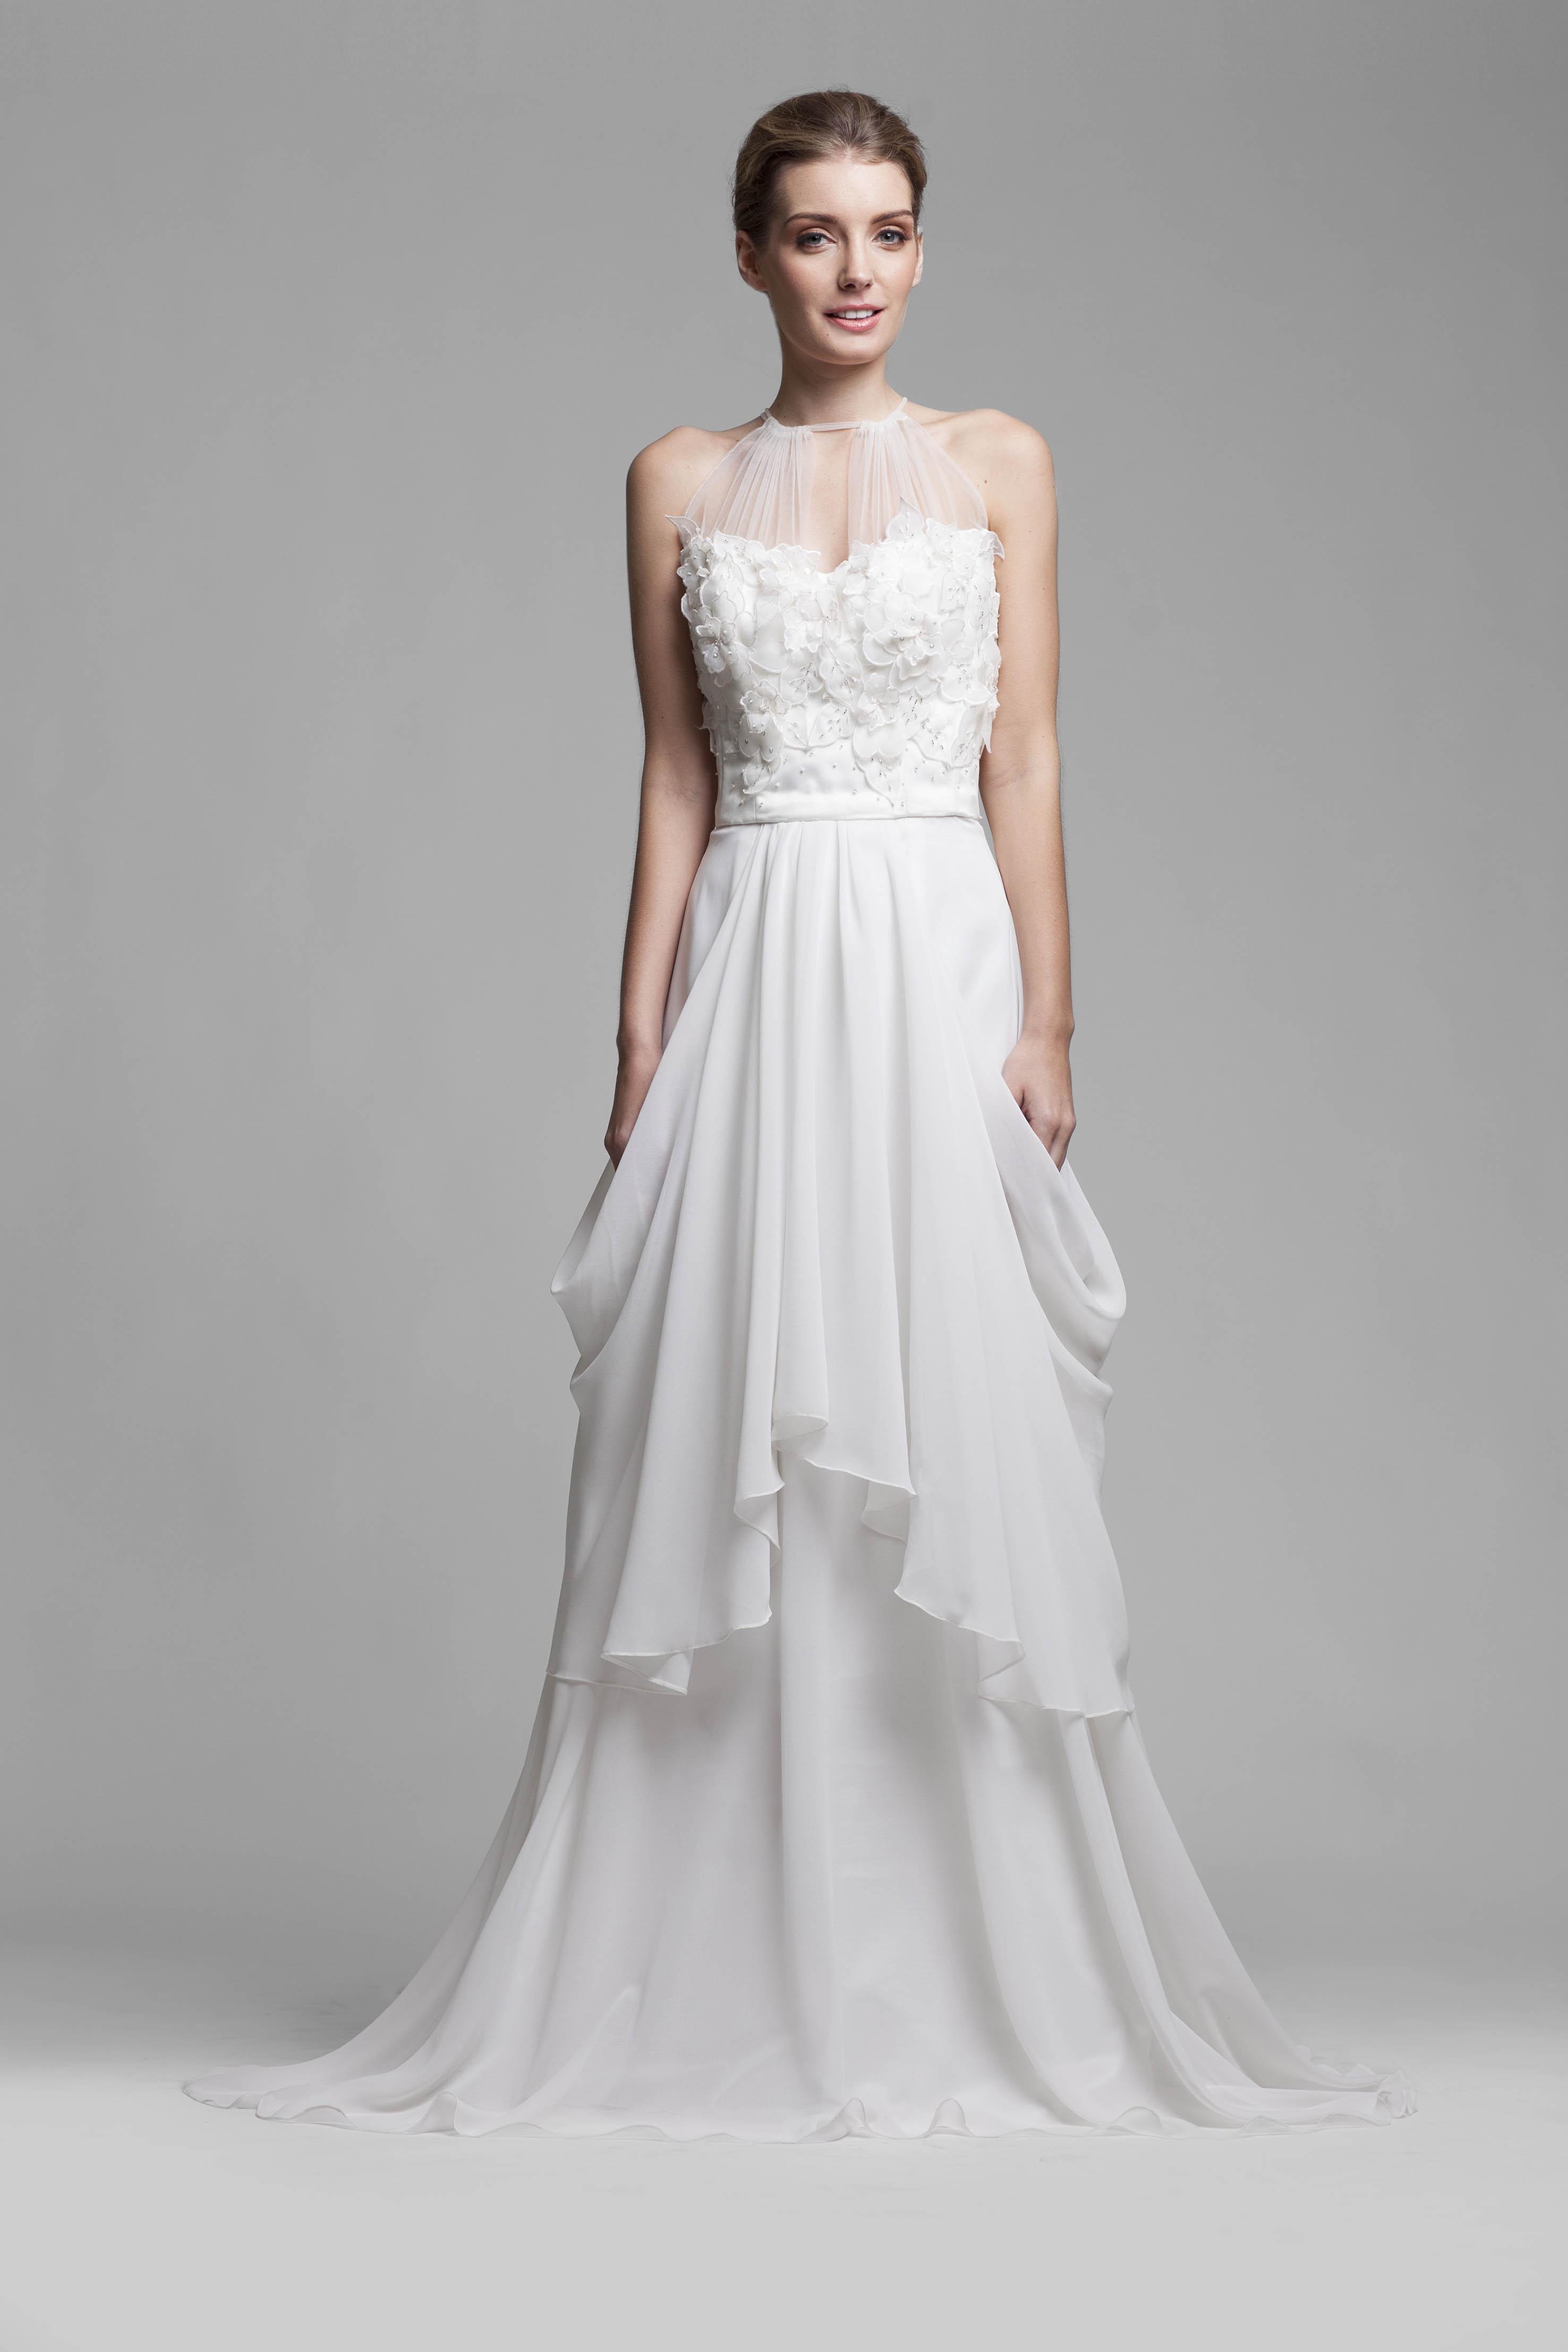 Famous high end wedding dress designers ornament for High end designer wedding dresses